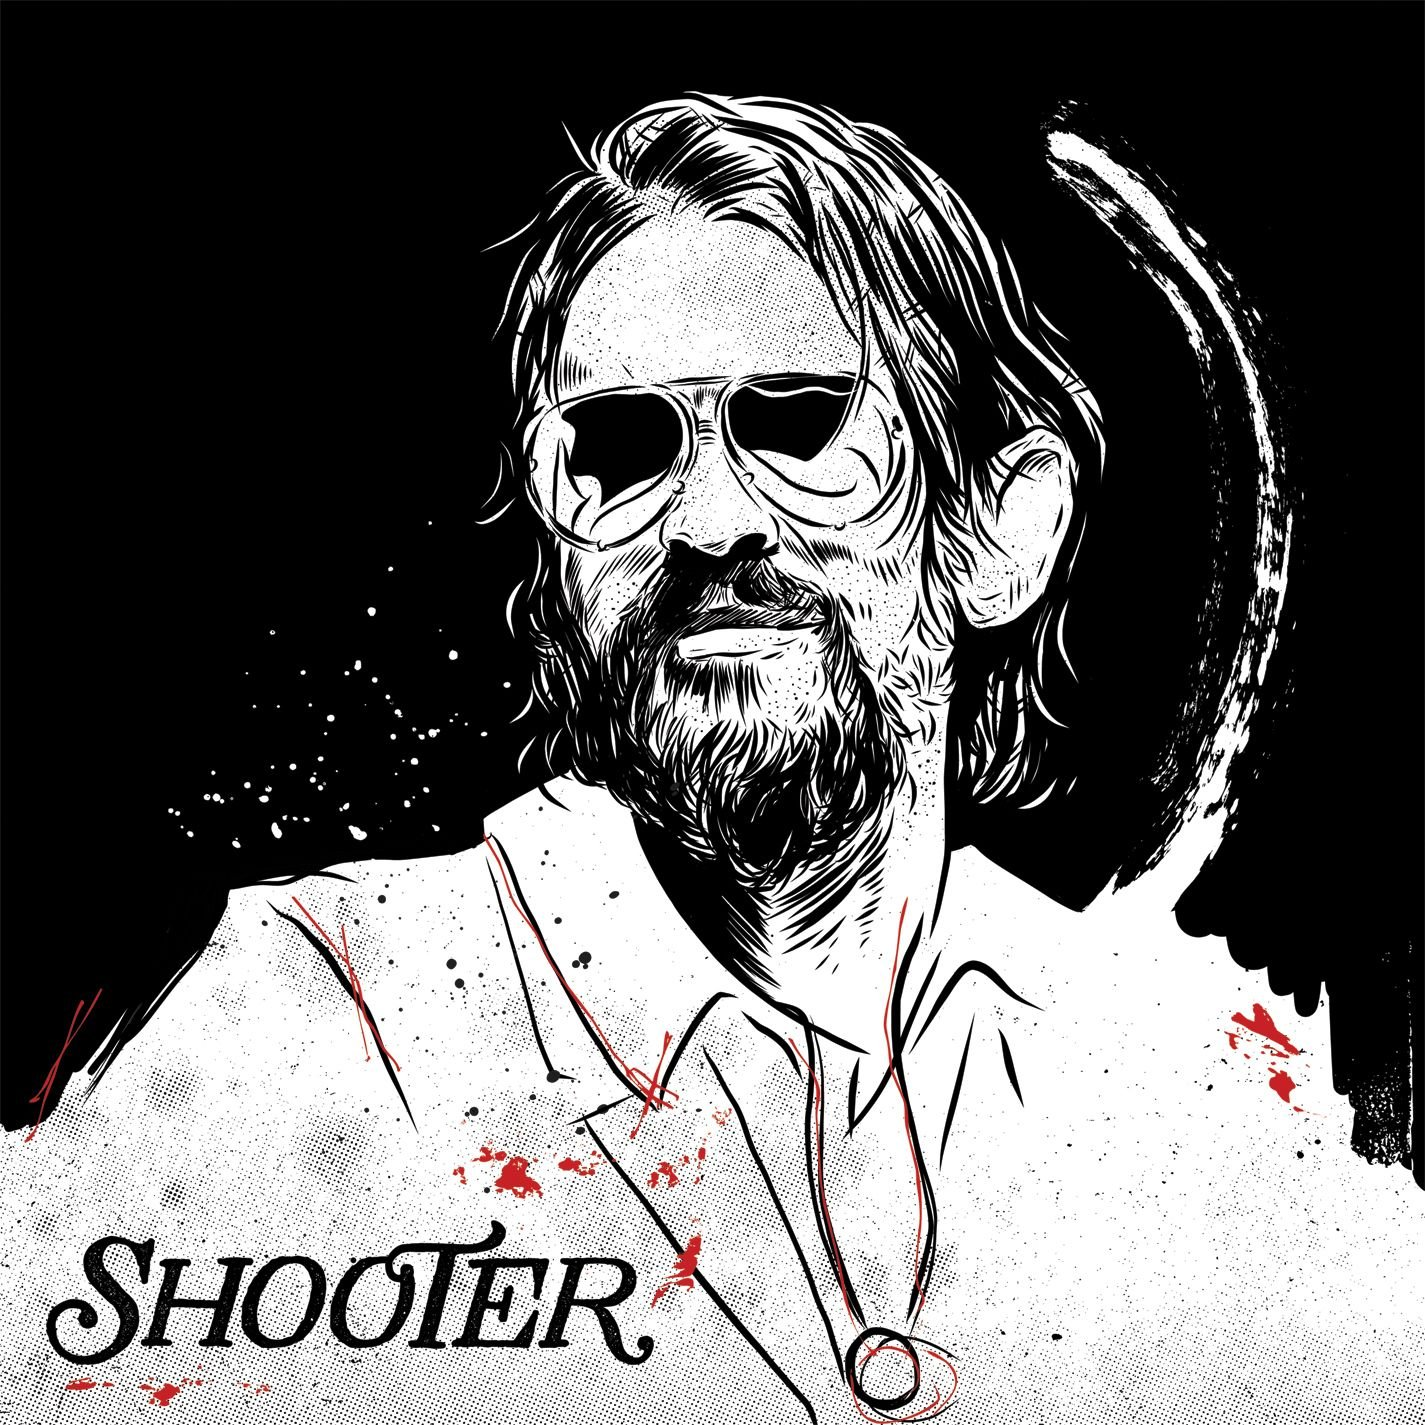 Shooter (Vinyl w/Digital Download)